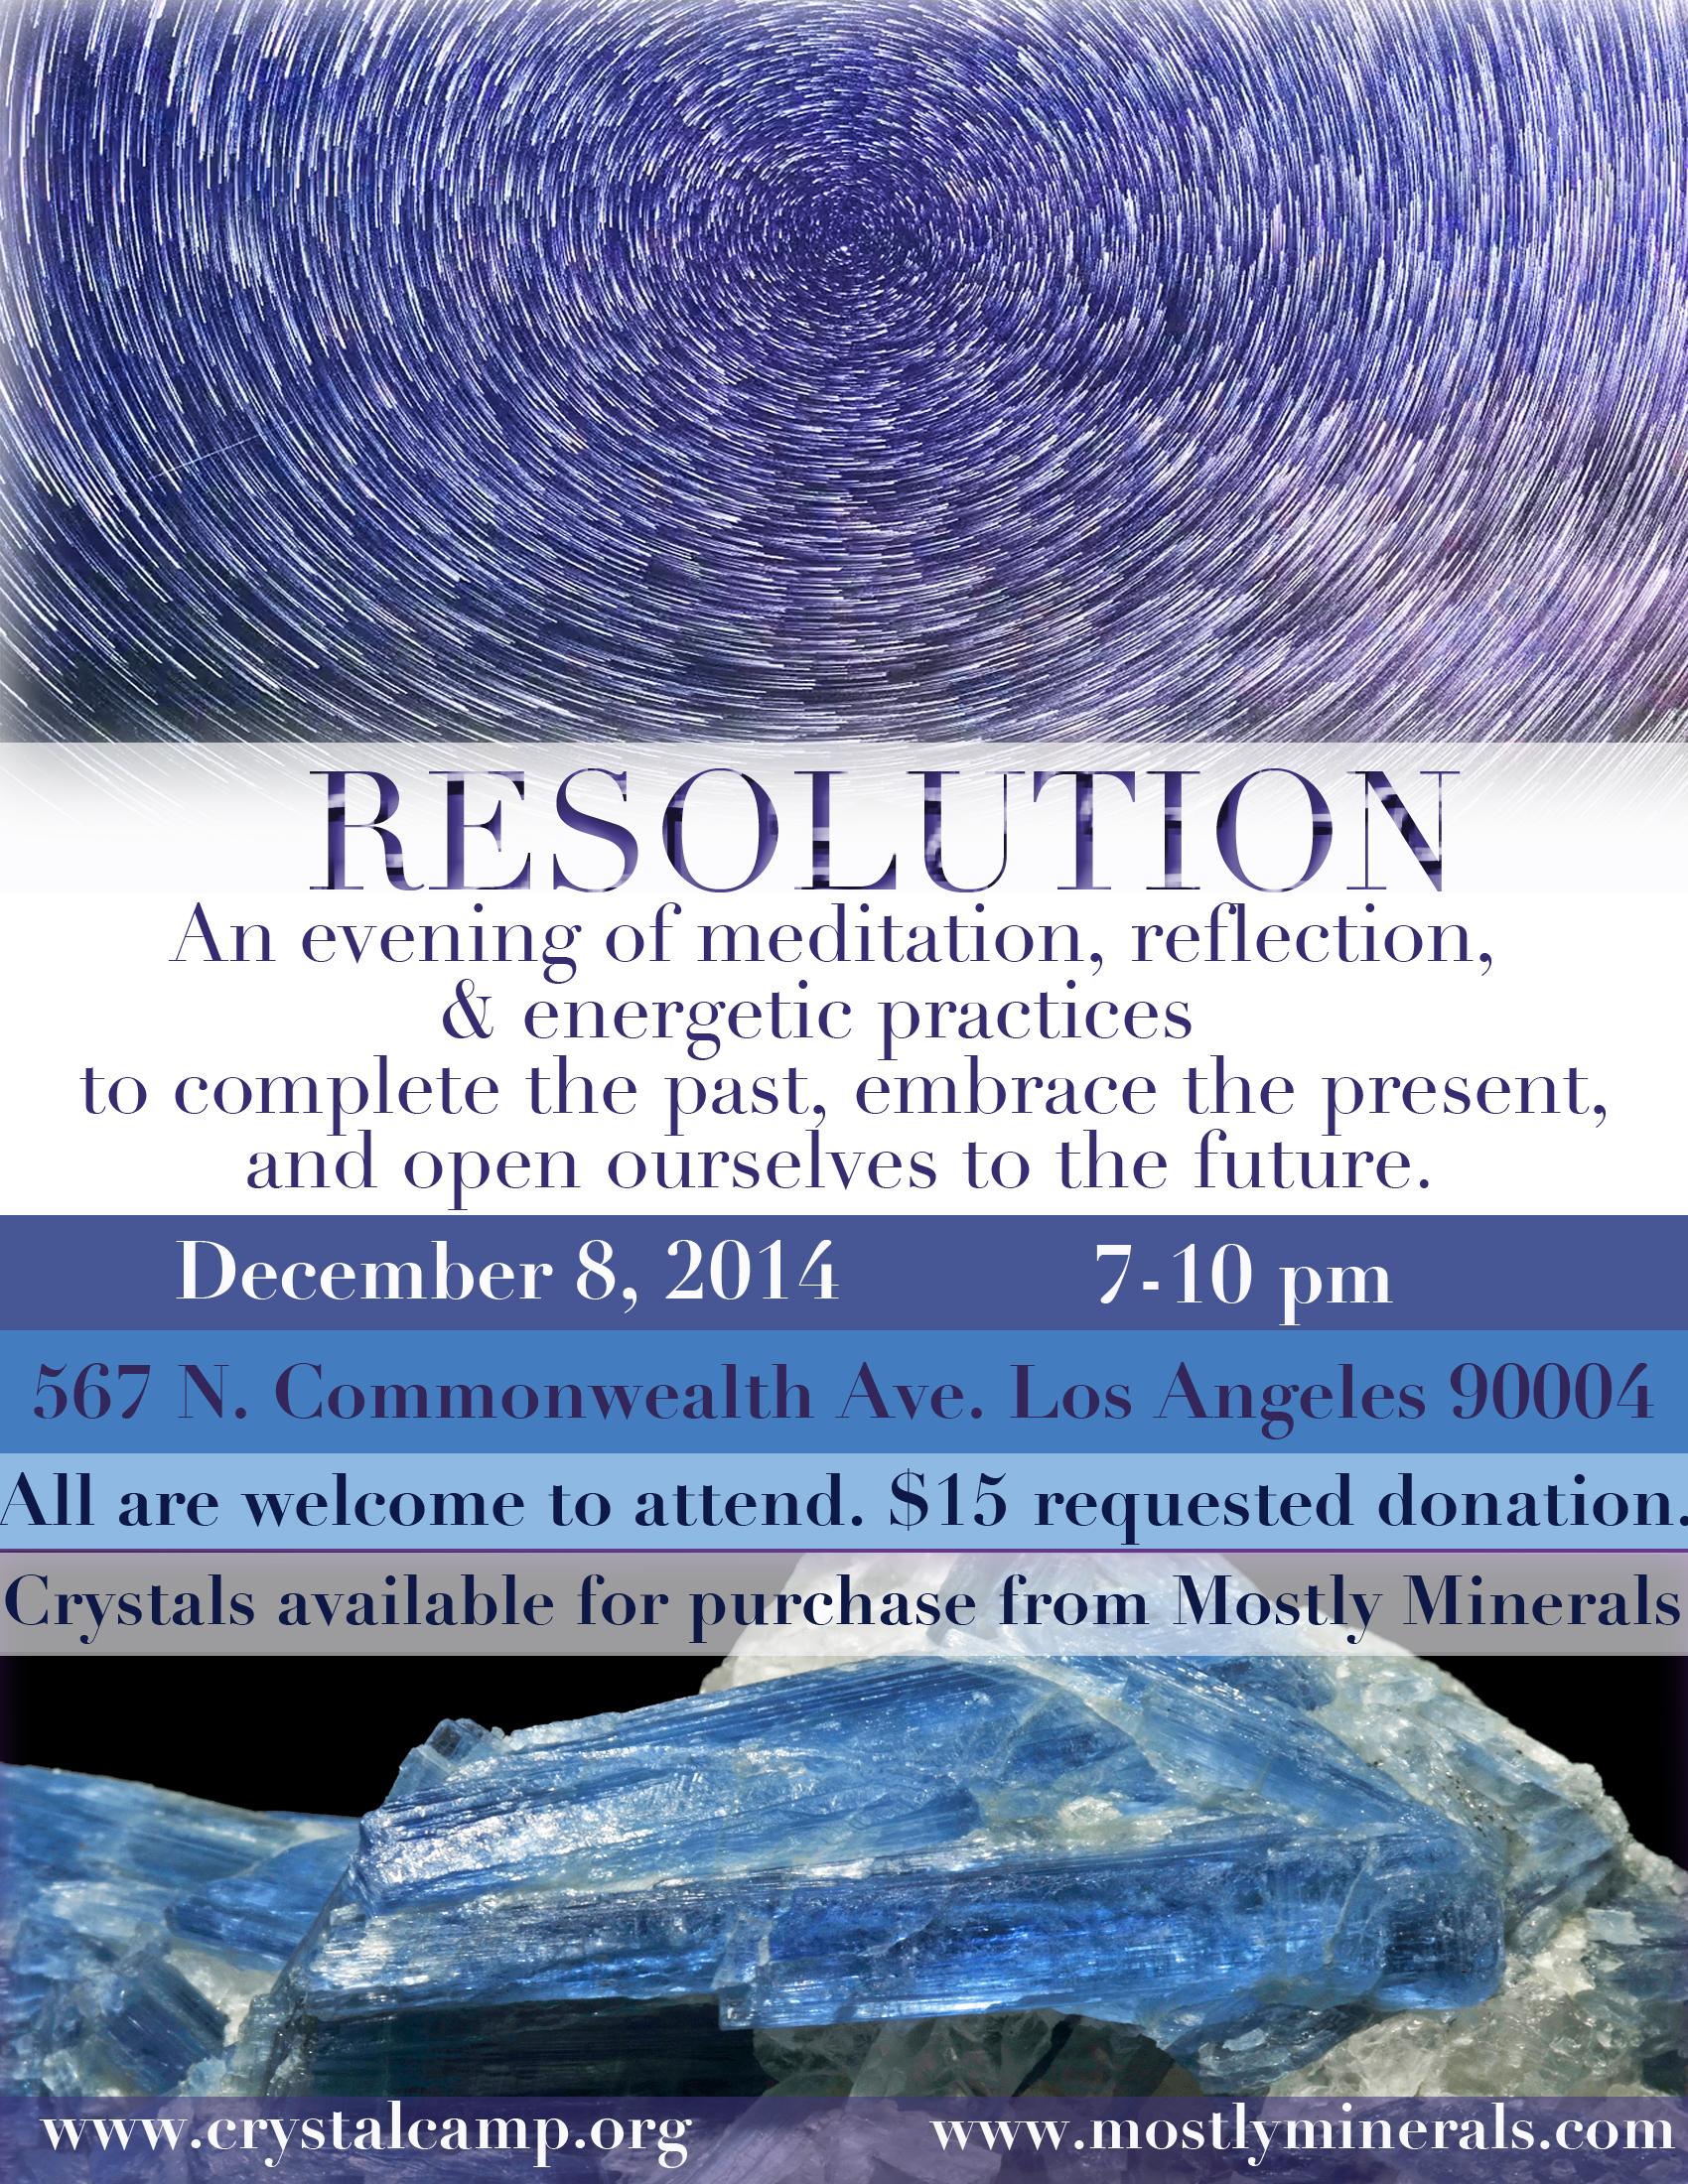 Resolution flyer - 12-8-14.jpg